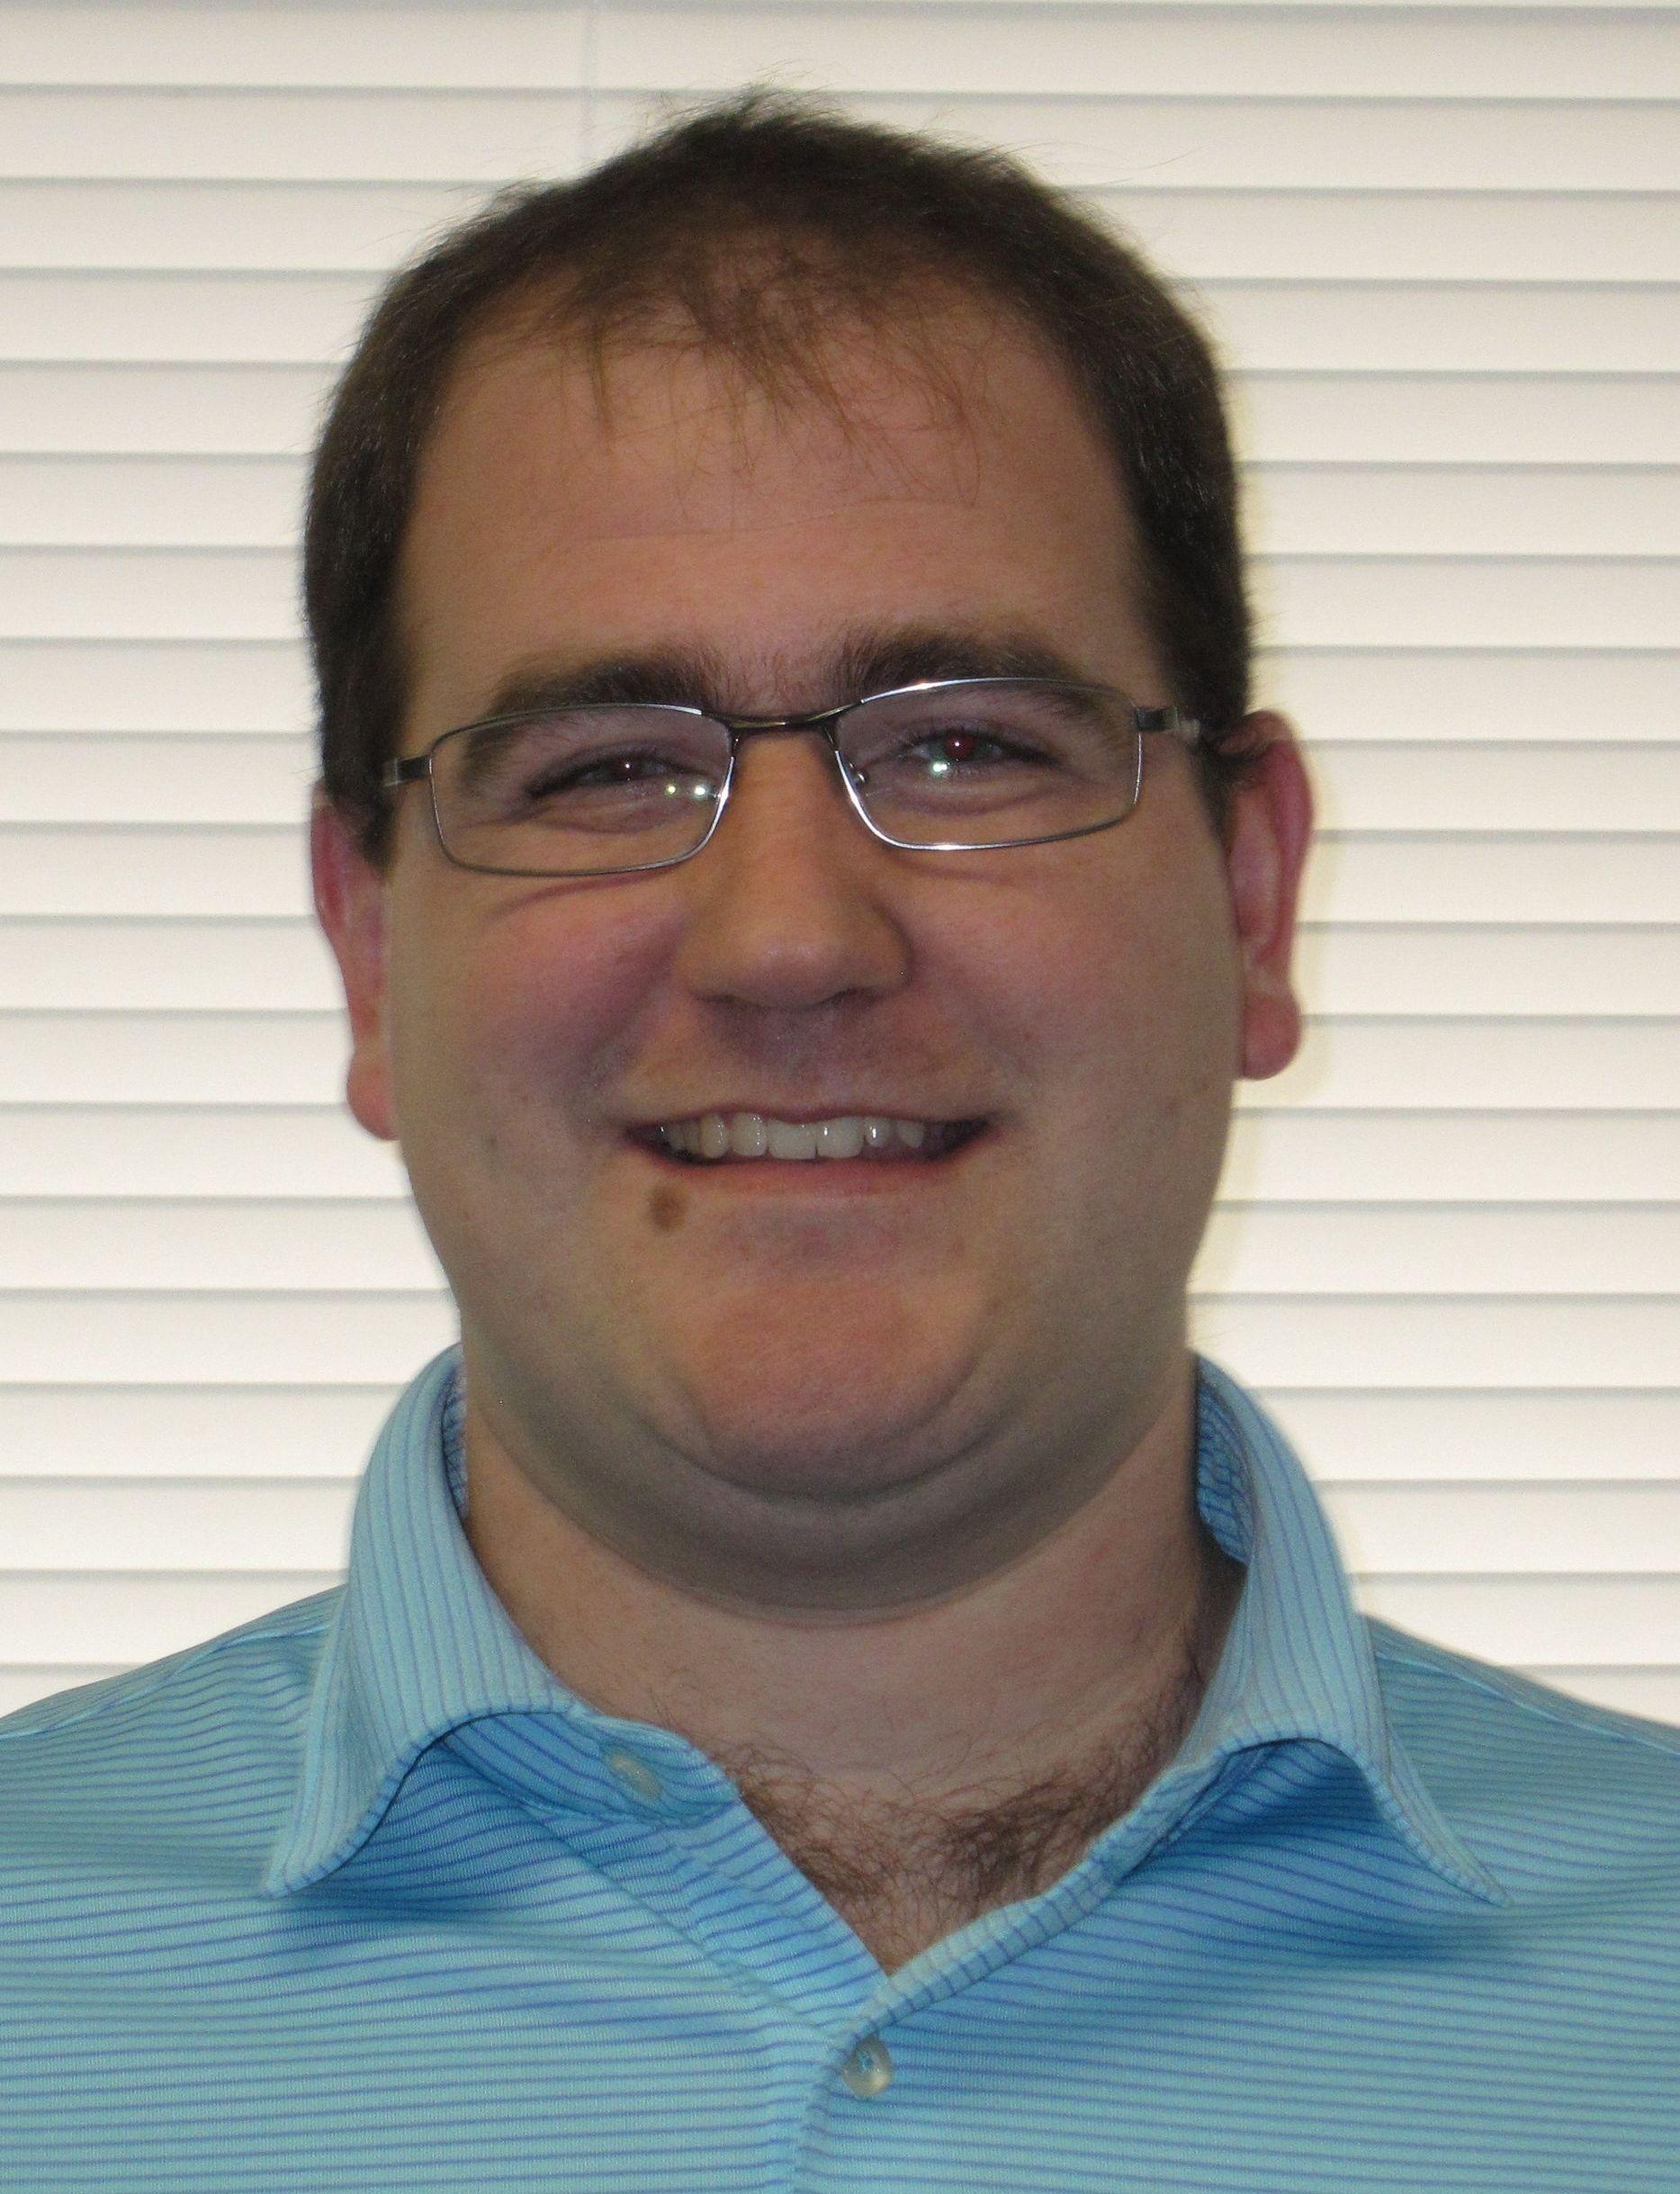 Matt Pritchard - Golf Professional, PGA 1st Assistant